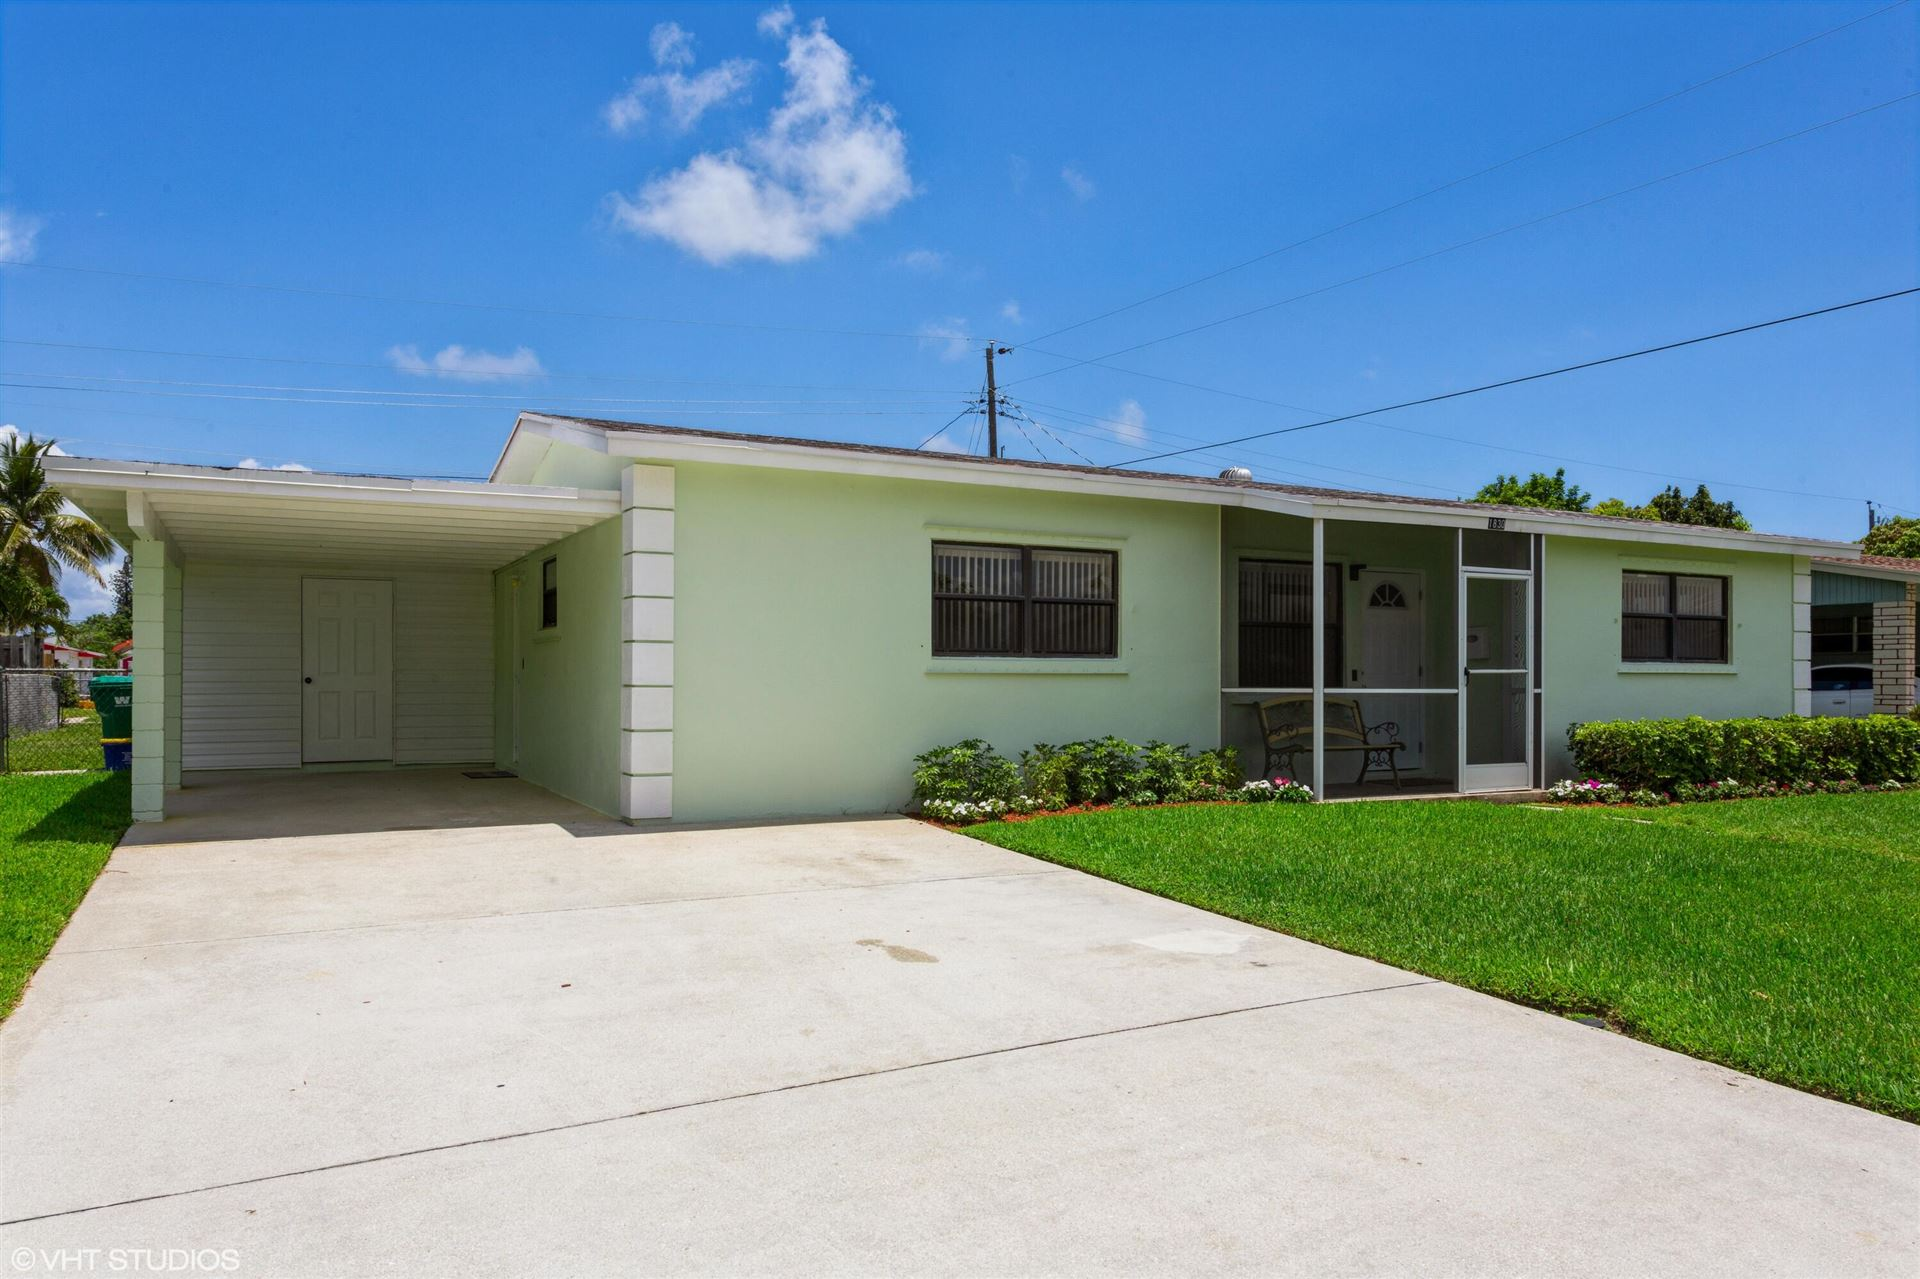 Photo of 1830 G Avenue, Riviera Beach, FL 33404 (MLS # RX-10728861)